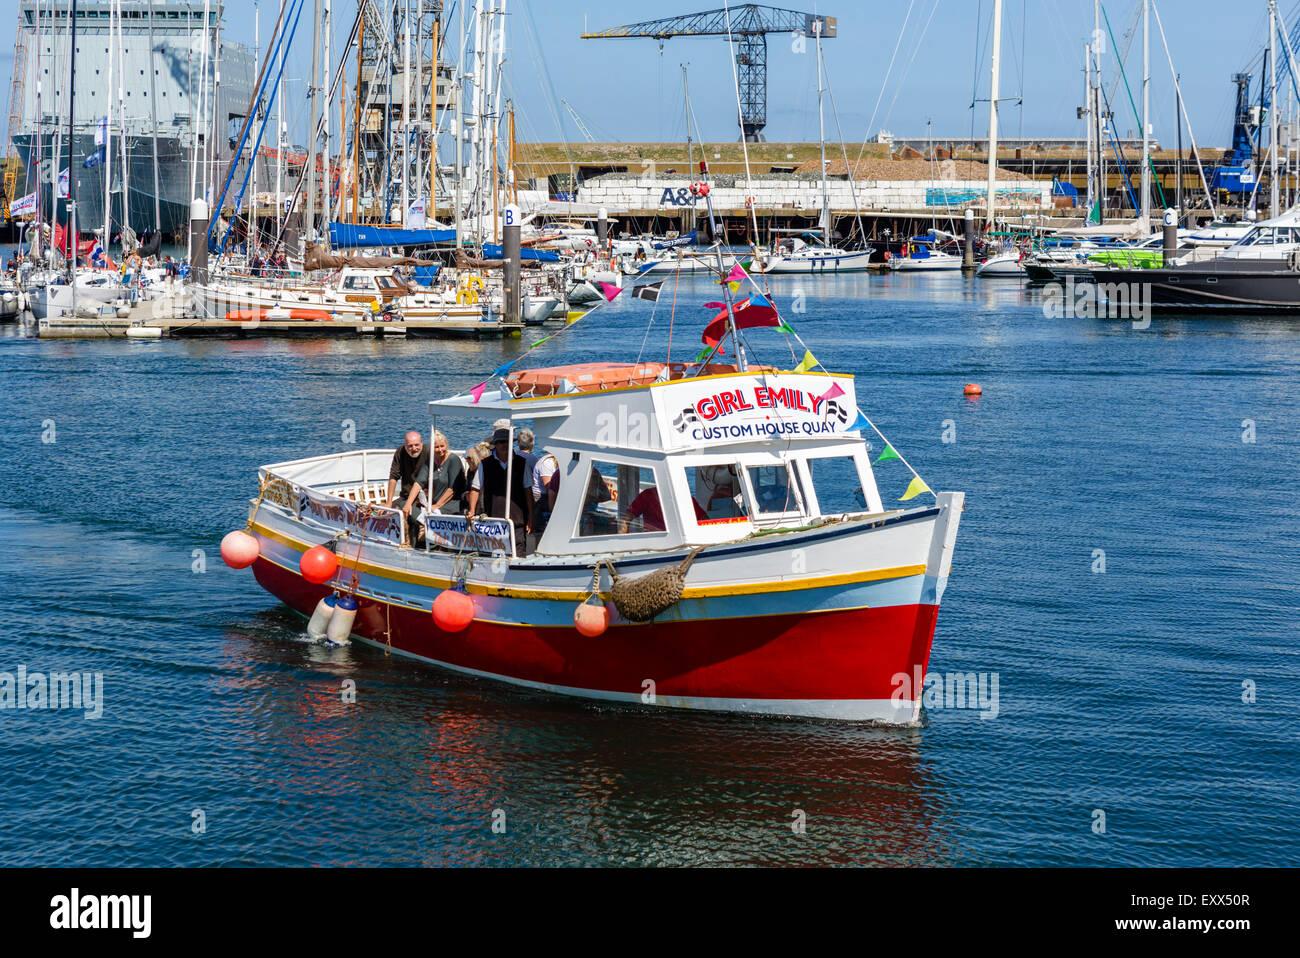 Viaje en barco regresando al puerto, Custom House Quay, Falmouth, Cornwall, Inglaterra, Reino Unido. Foto de stock